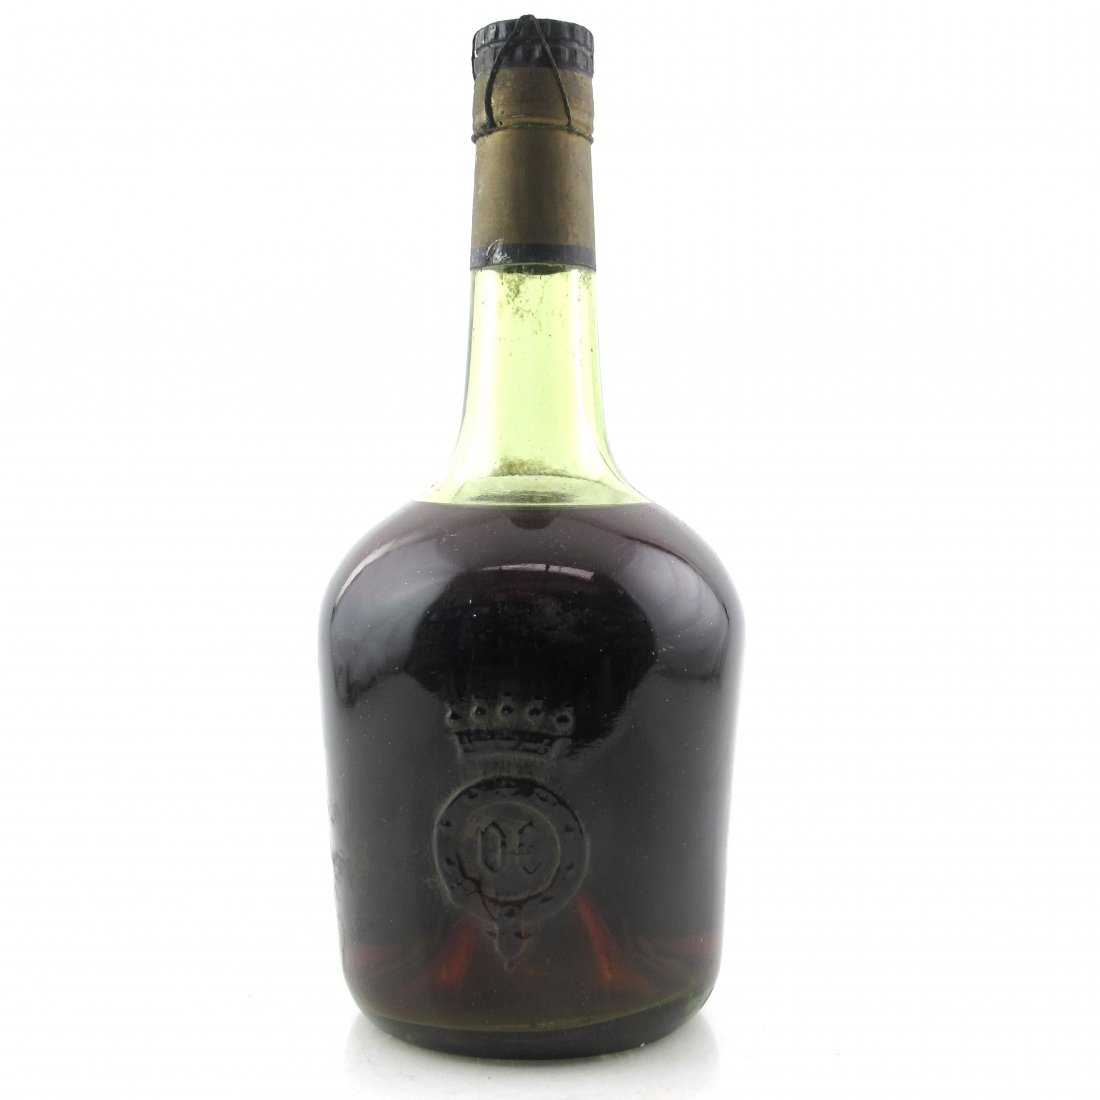 Otard Cognac 1940s